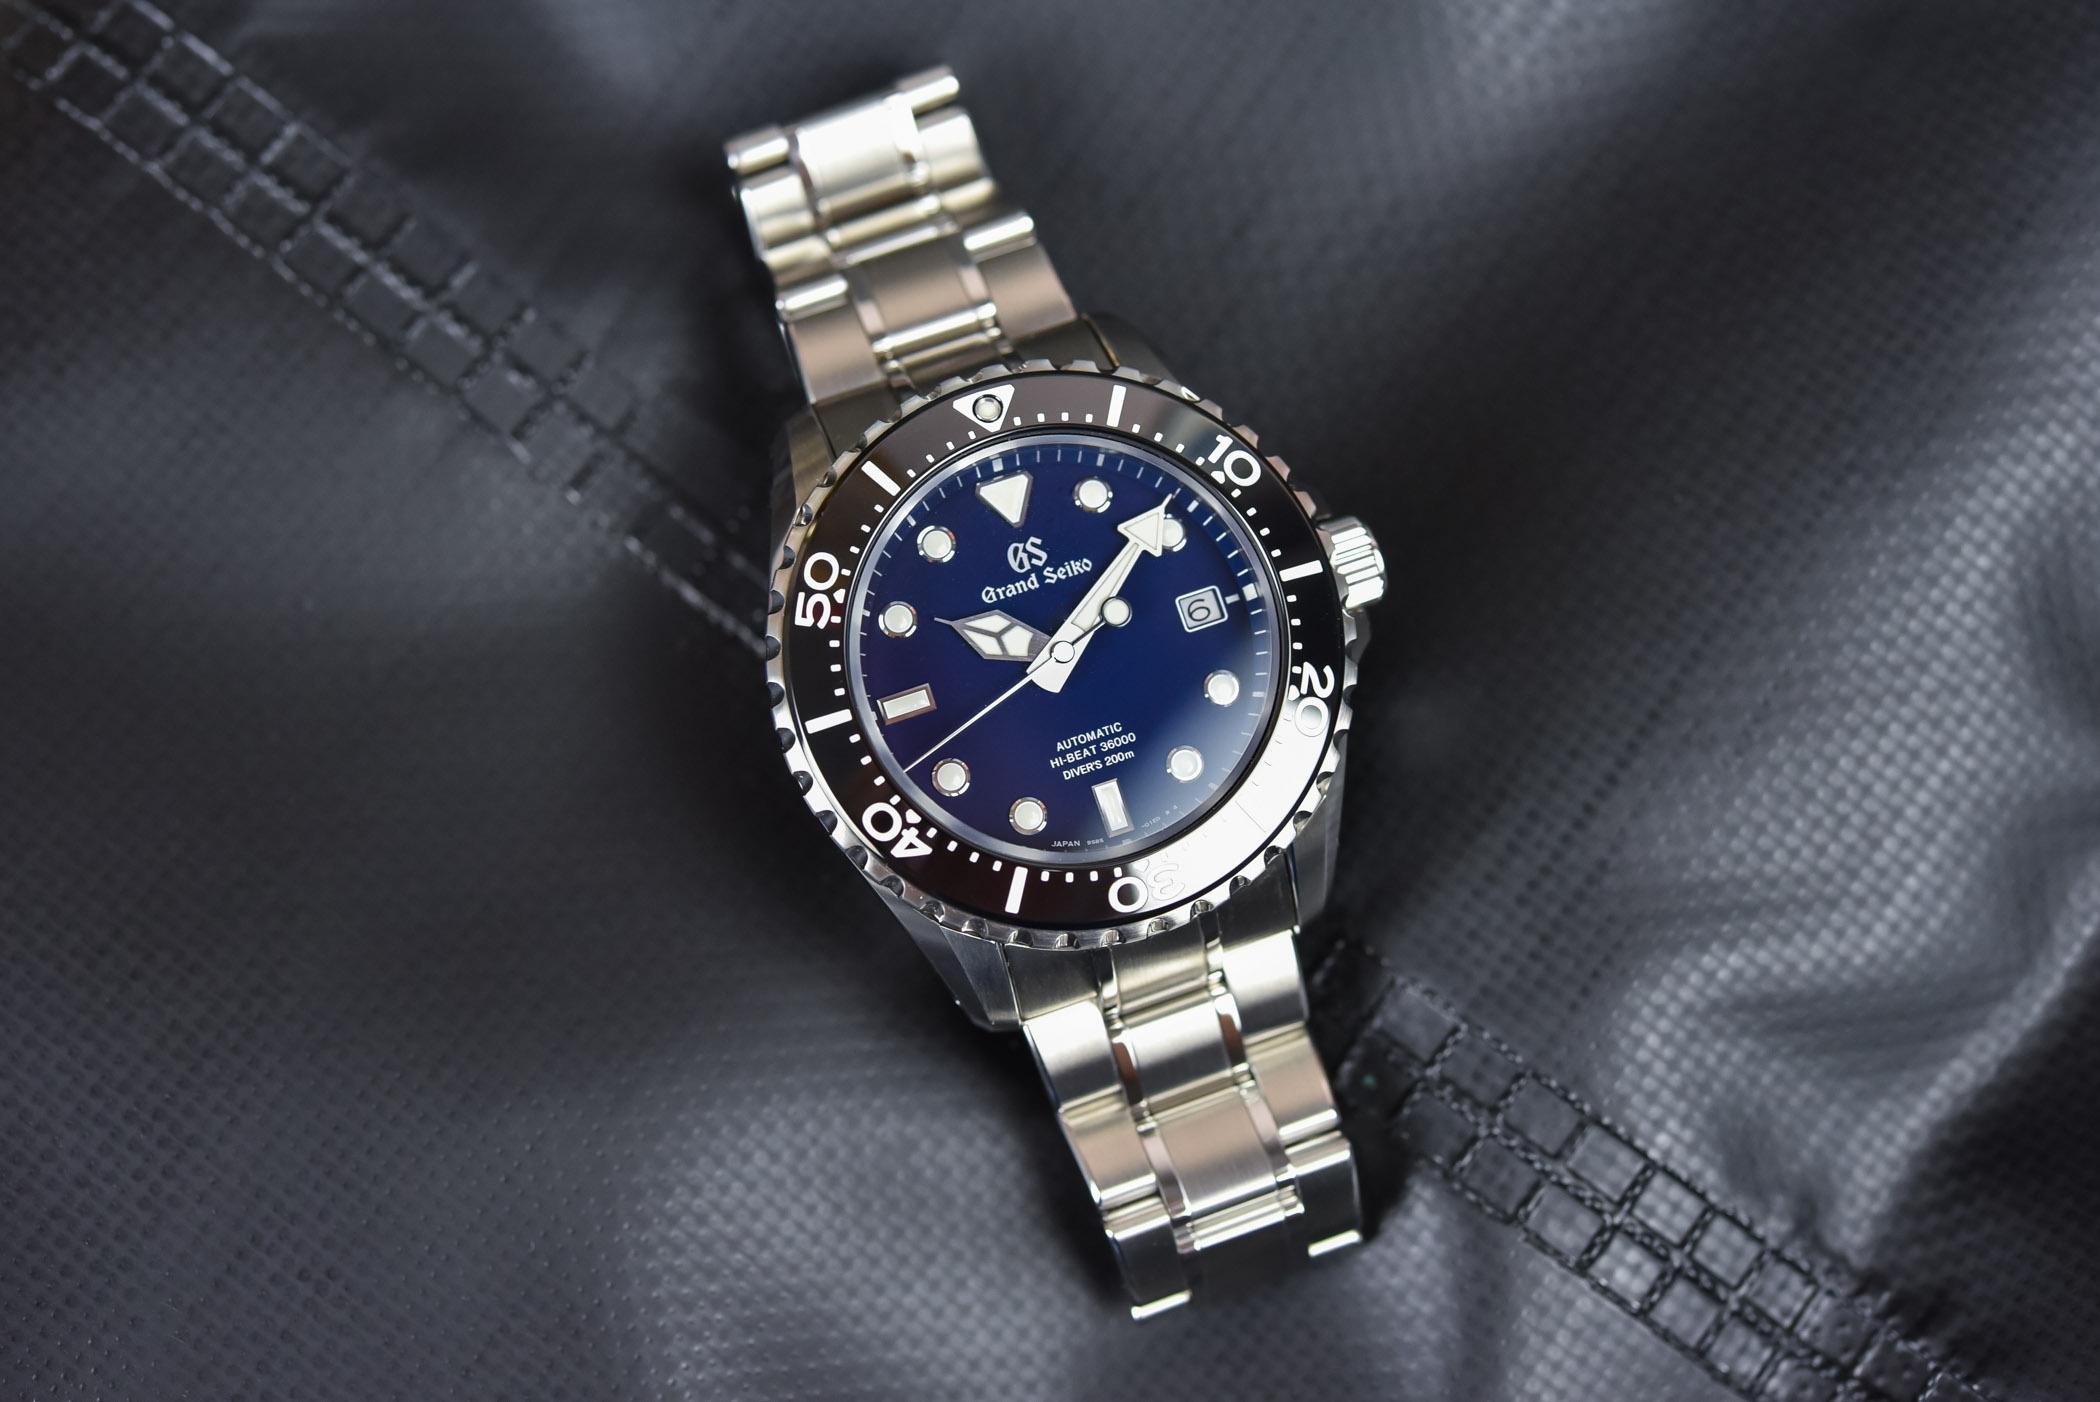 Grand Seiko Hi-Beat 200m Diver SBGH289 calibre 9S85